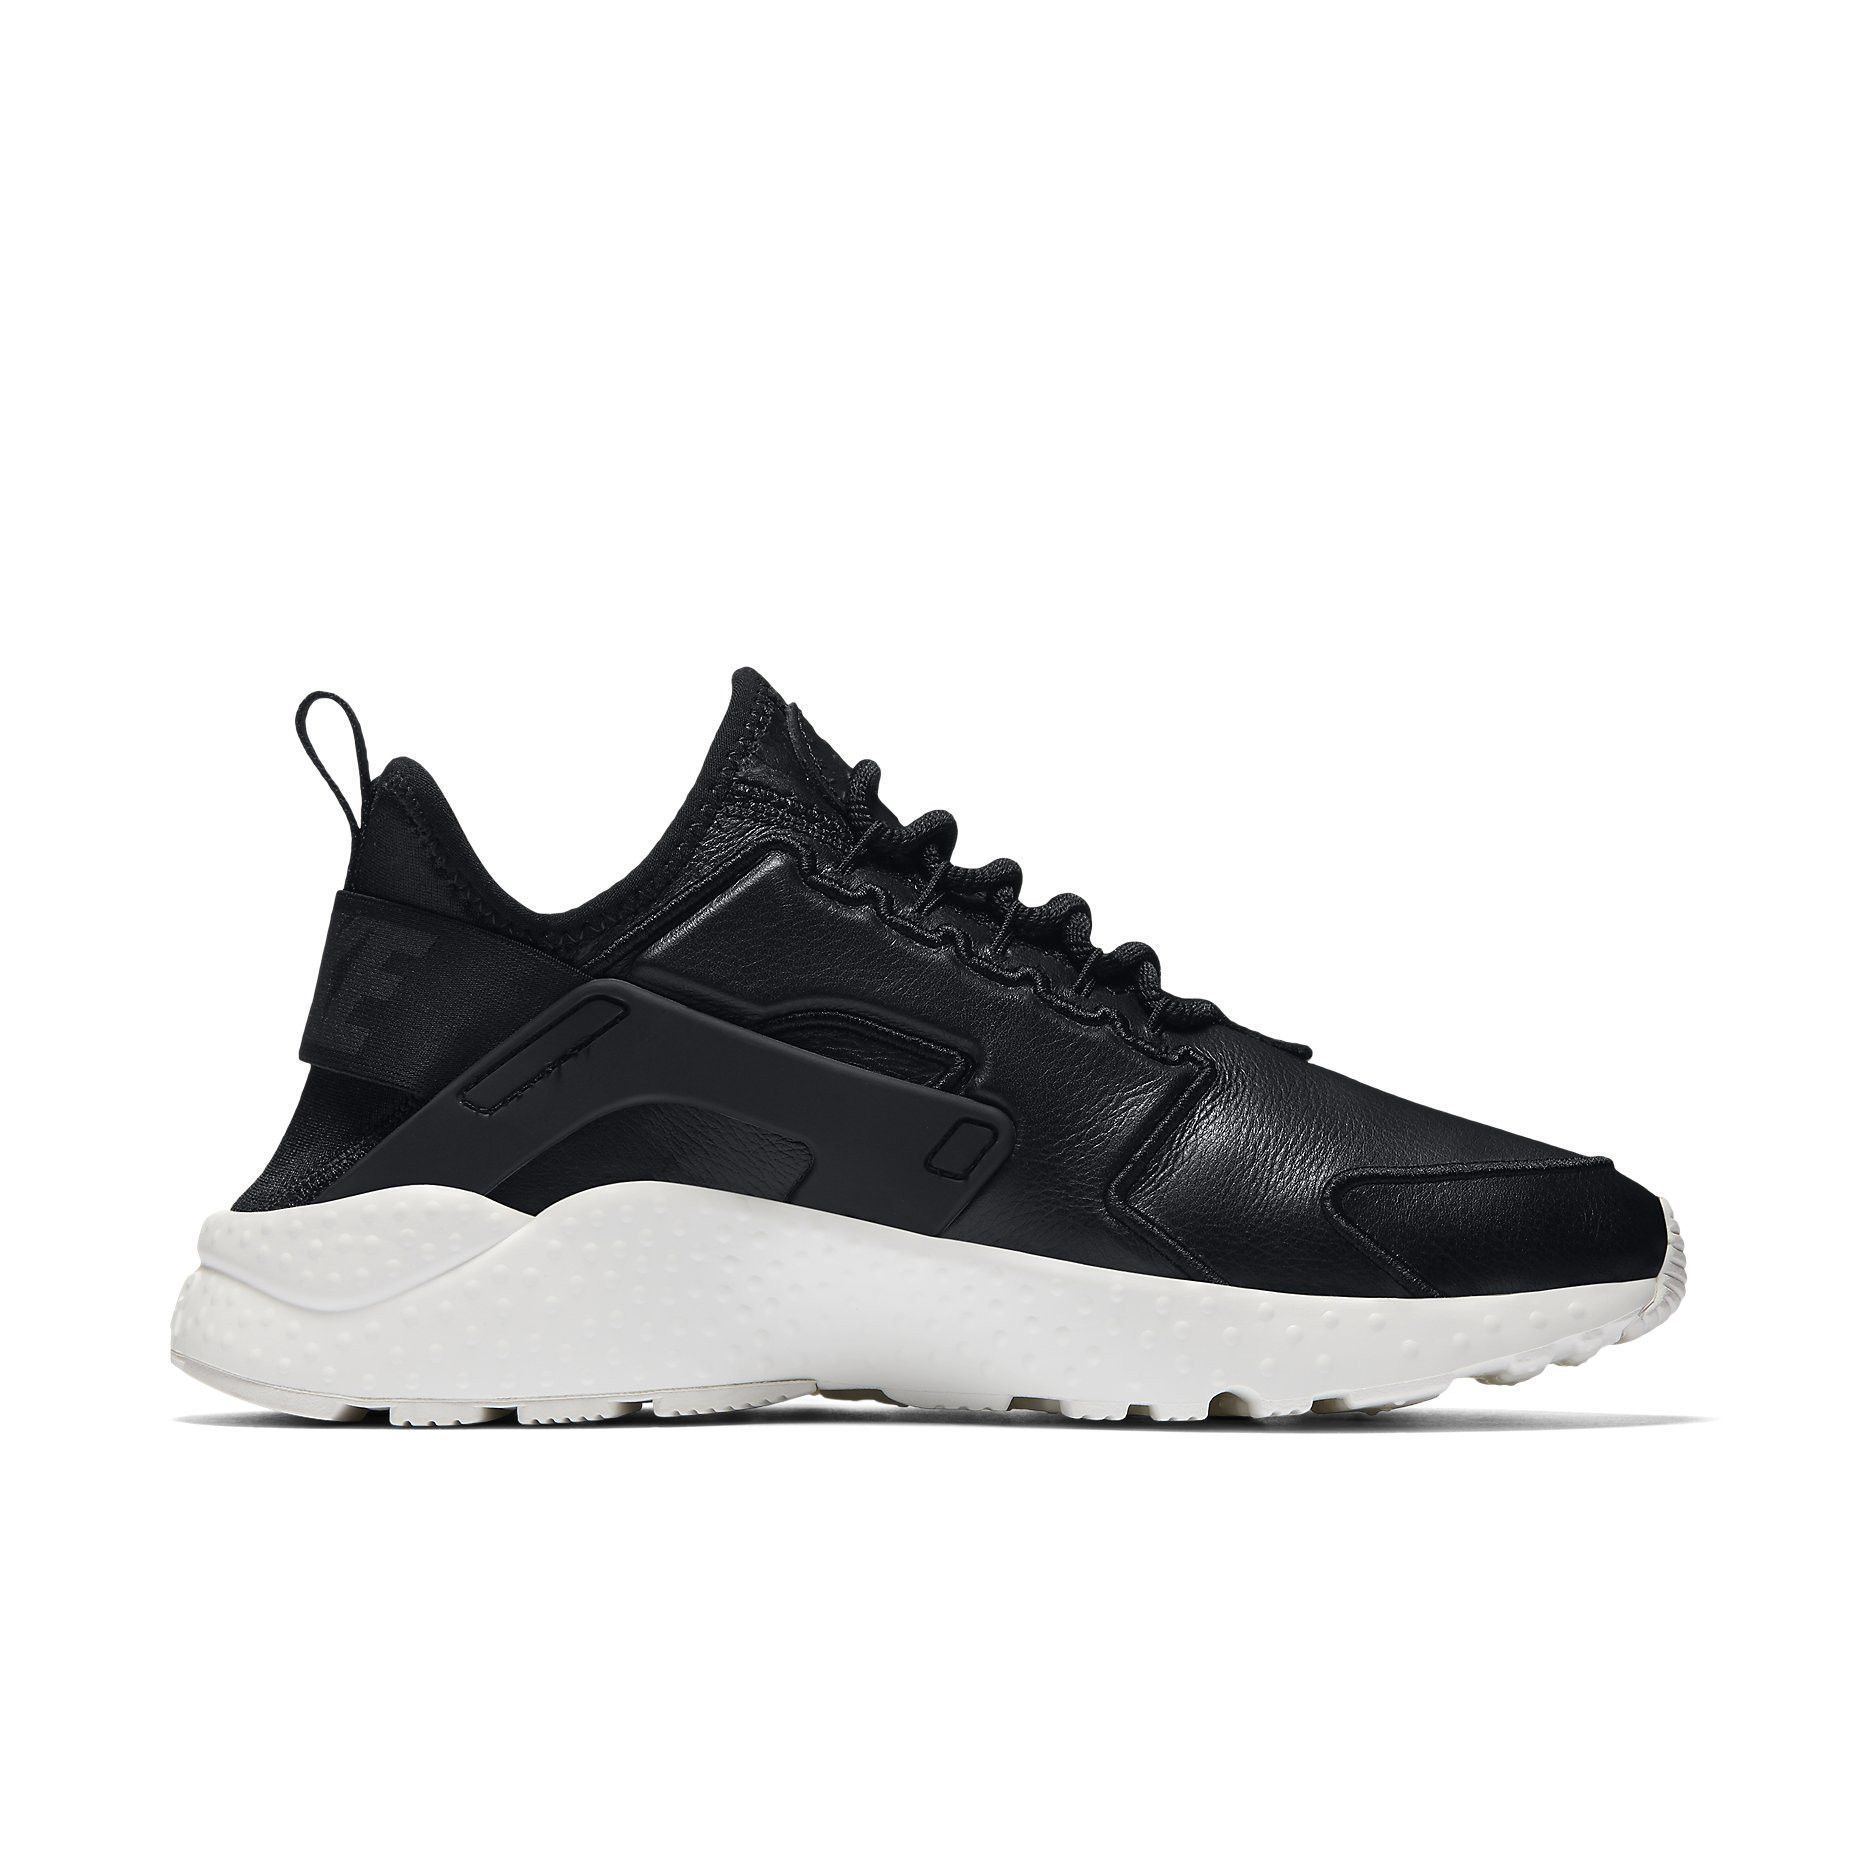 finest selection c36a5 cbb7a ... sport shoes nike air huarache ultra se premium team red black white  819685 601 mens running shoes  ...